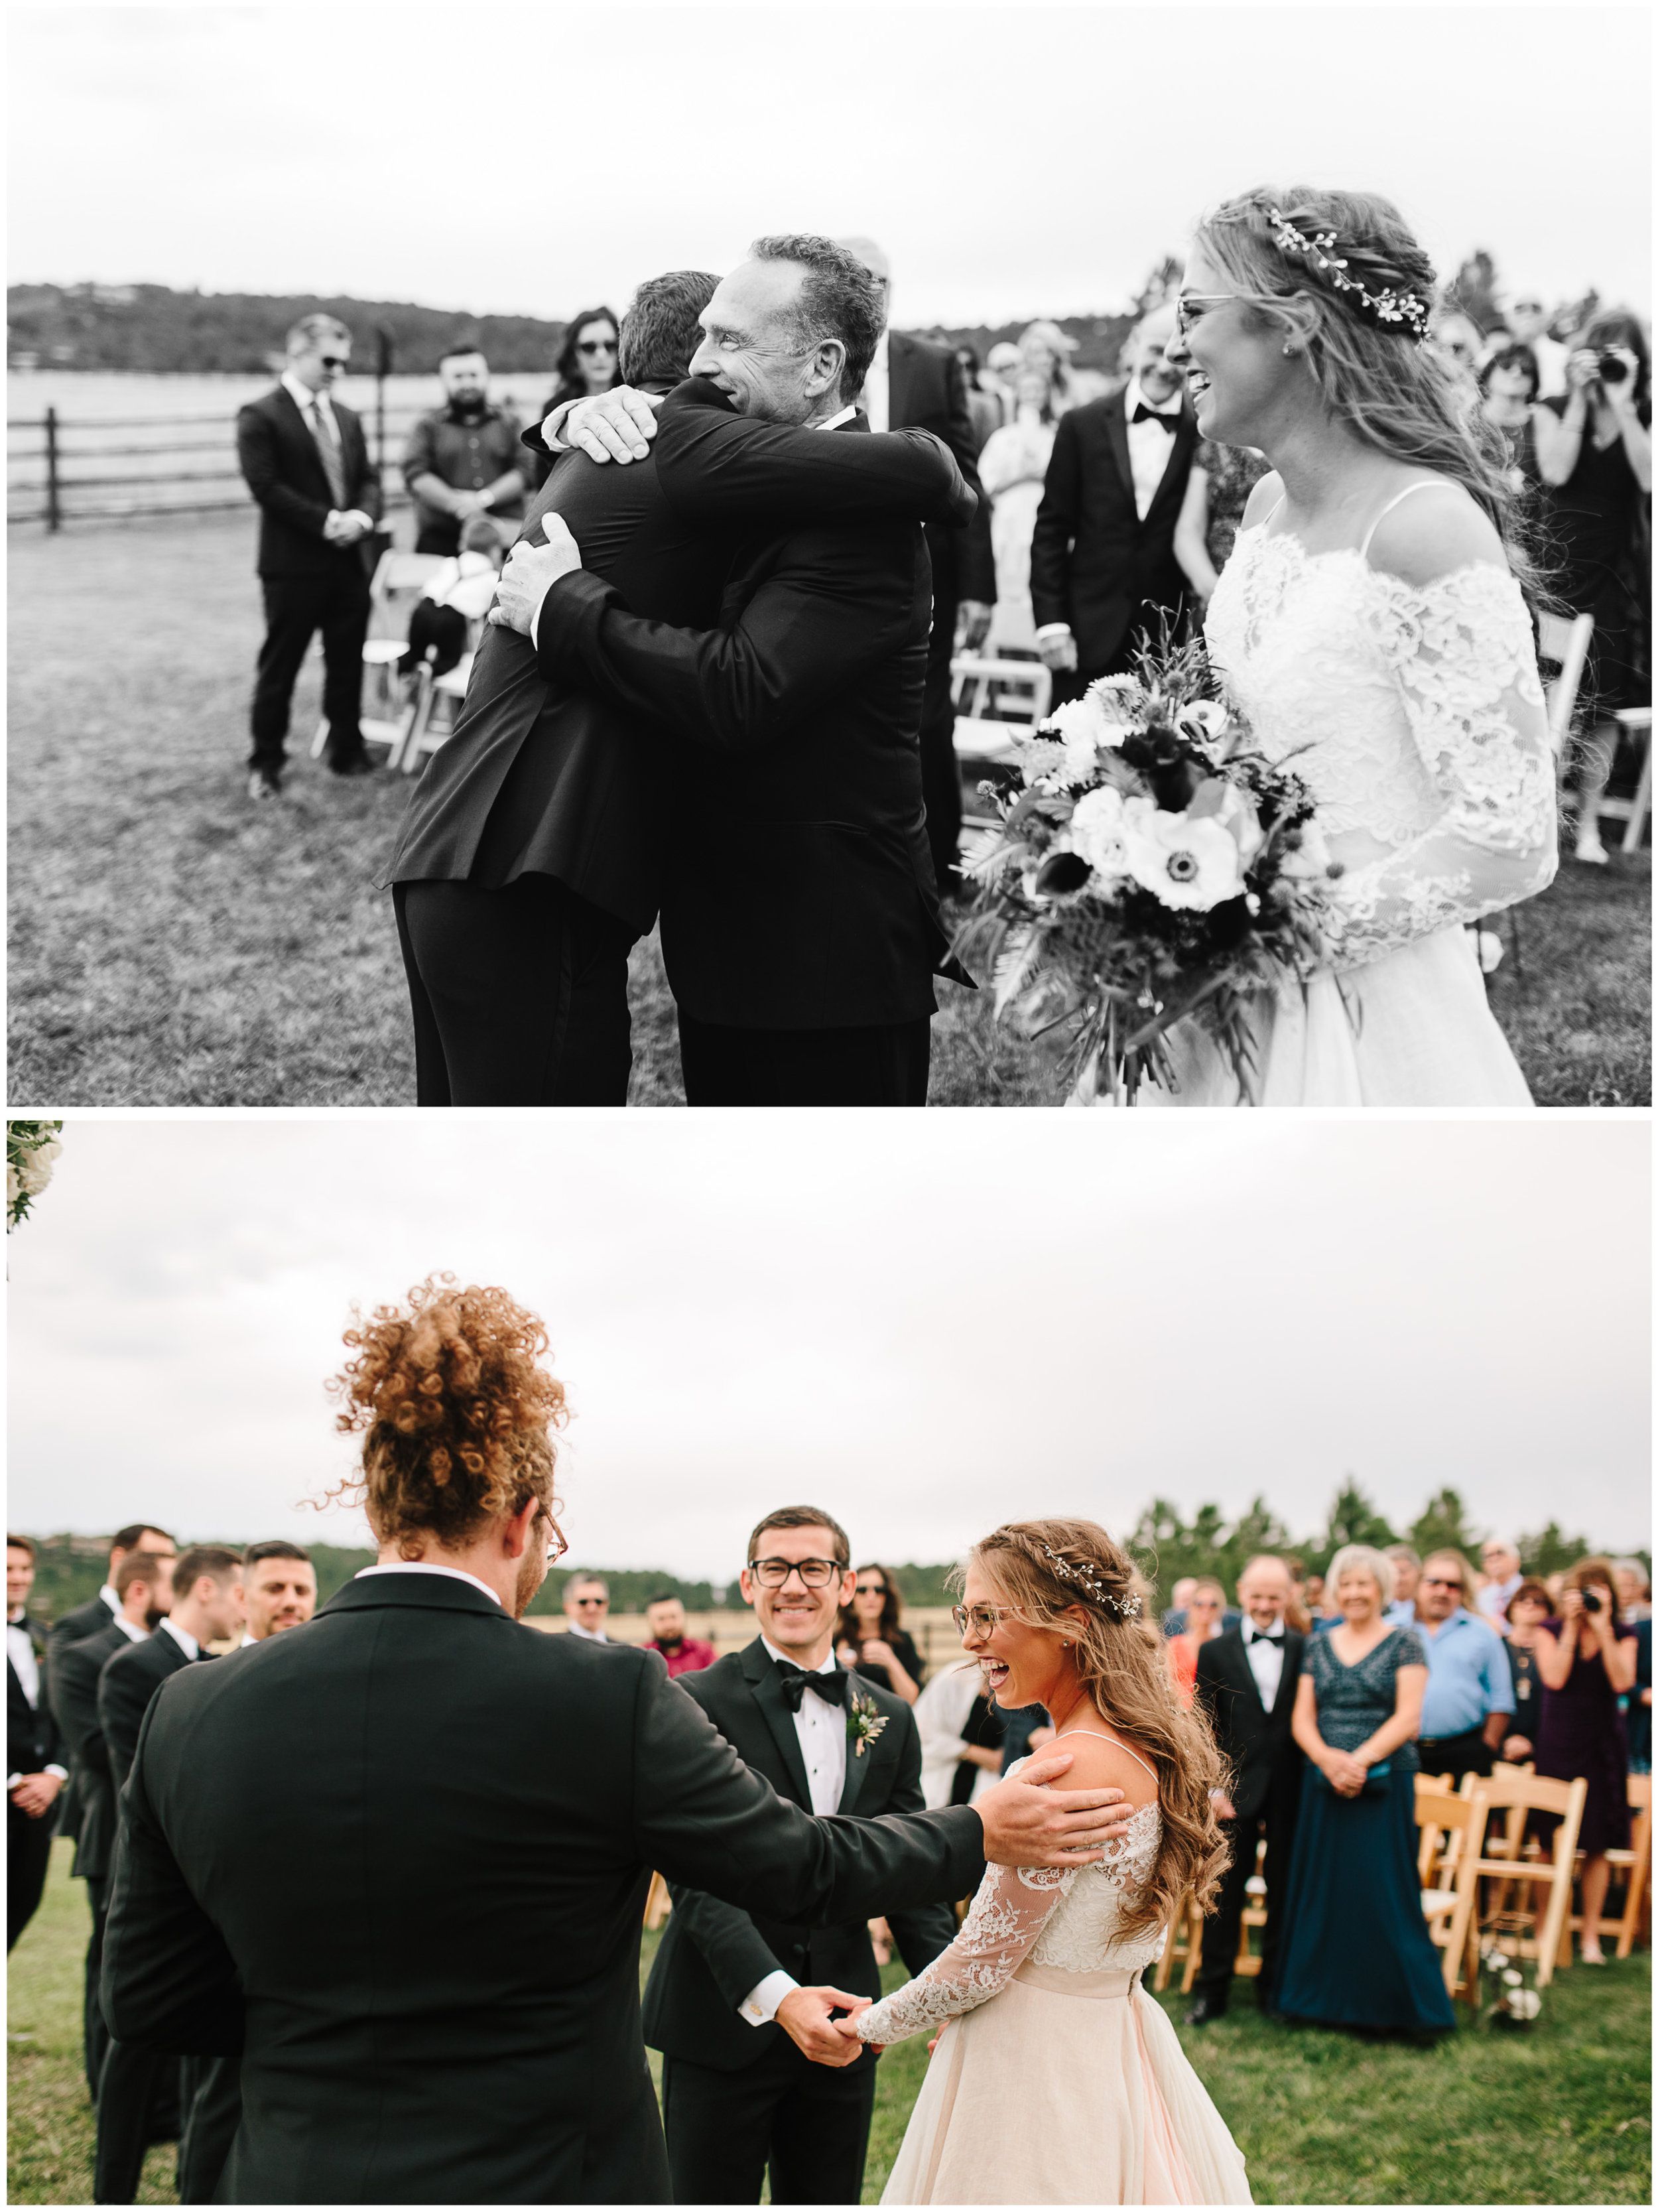 spruce_mountain_ranch_wedding_52.jpg